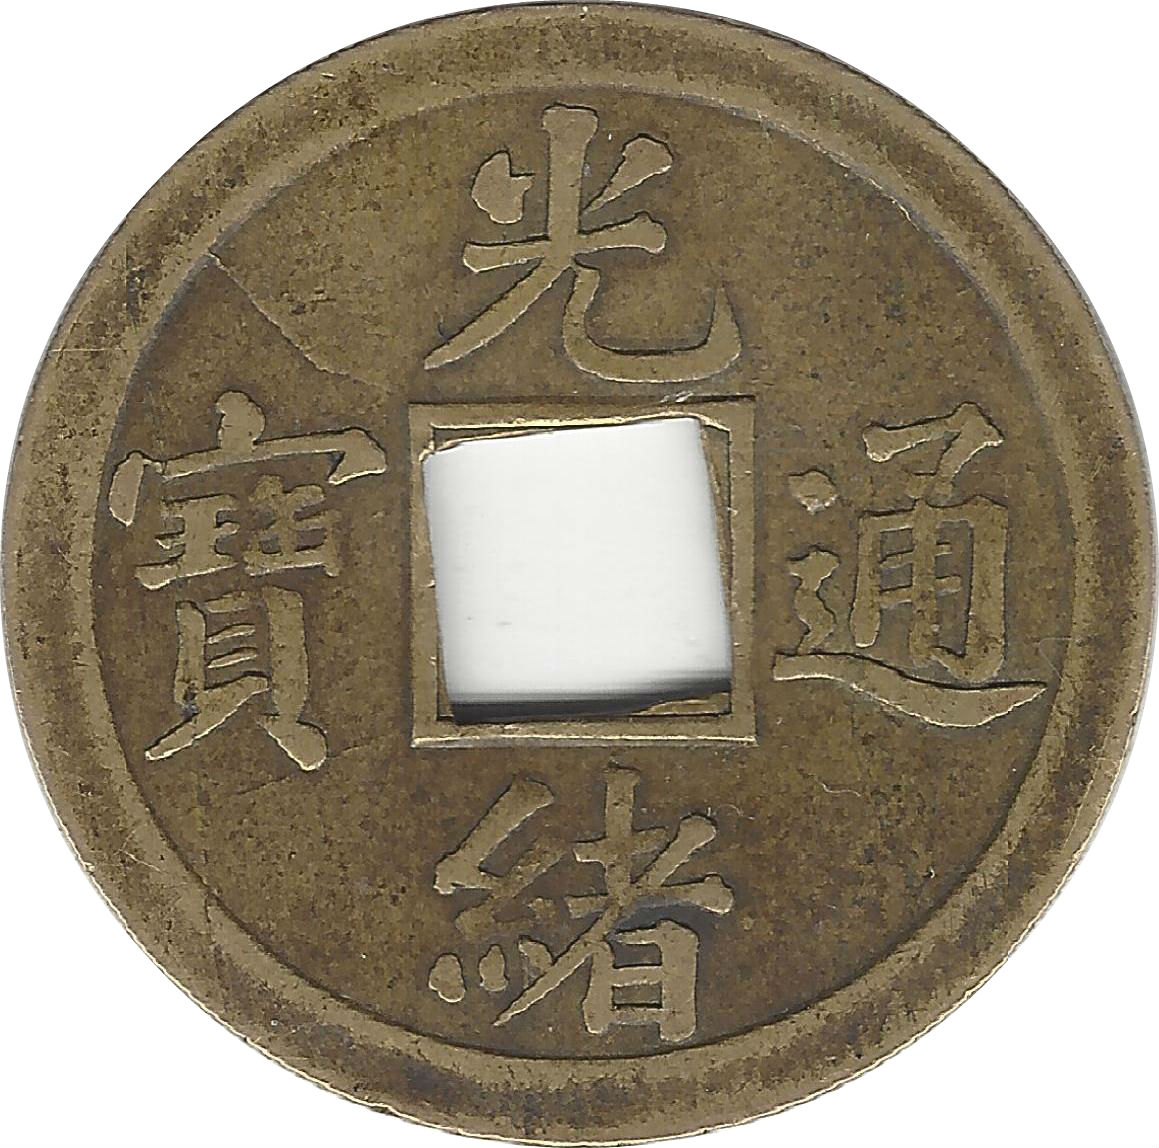 worksheet Coin Identifier similiar chinese coin identifier keywords identification numista